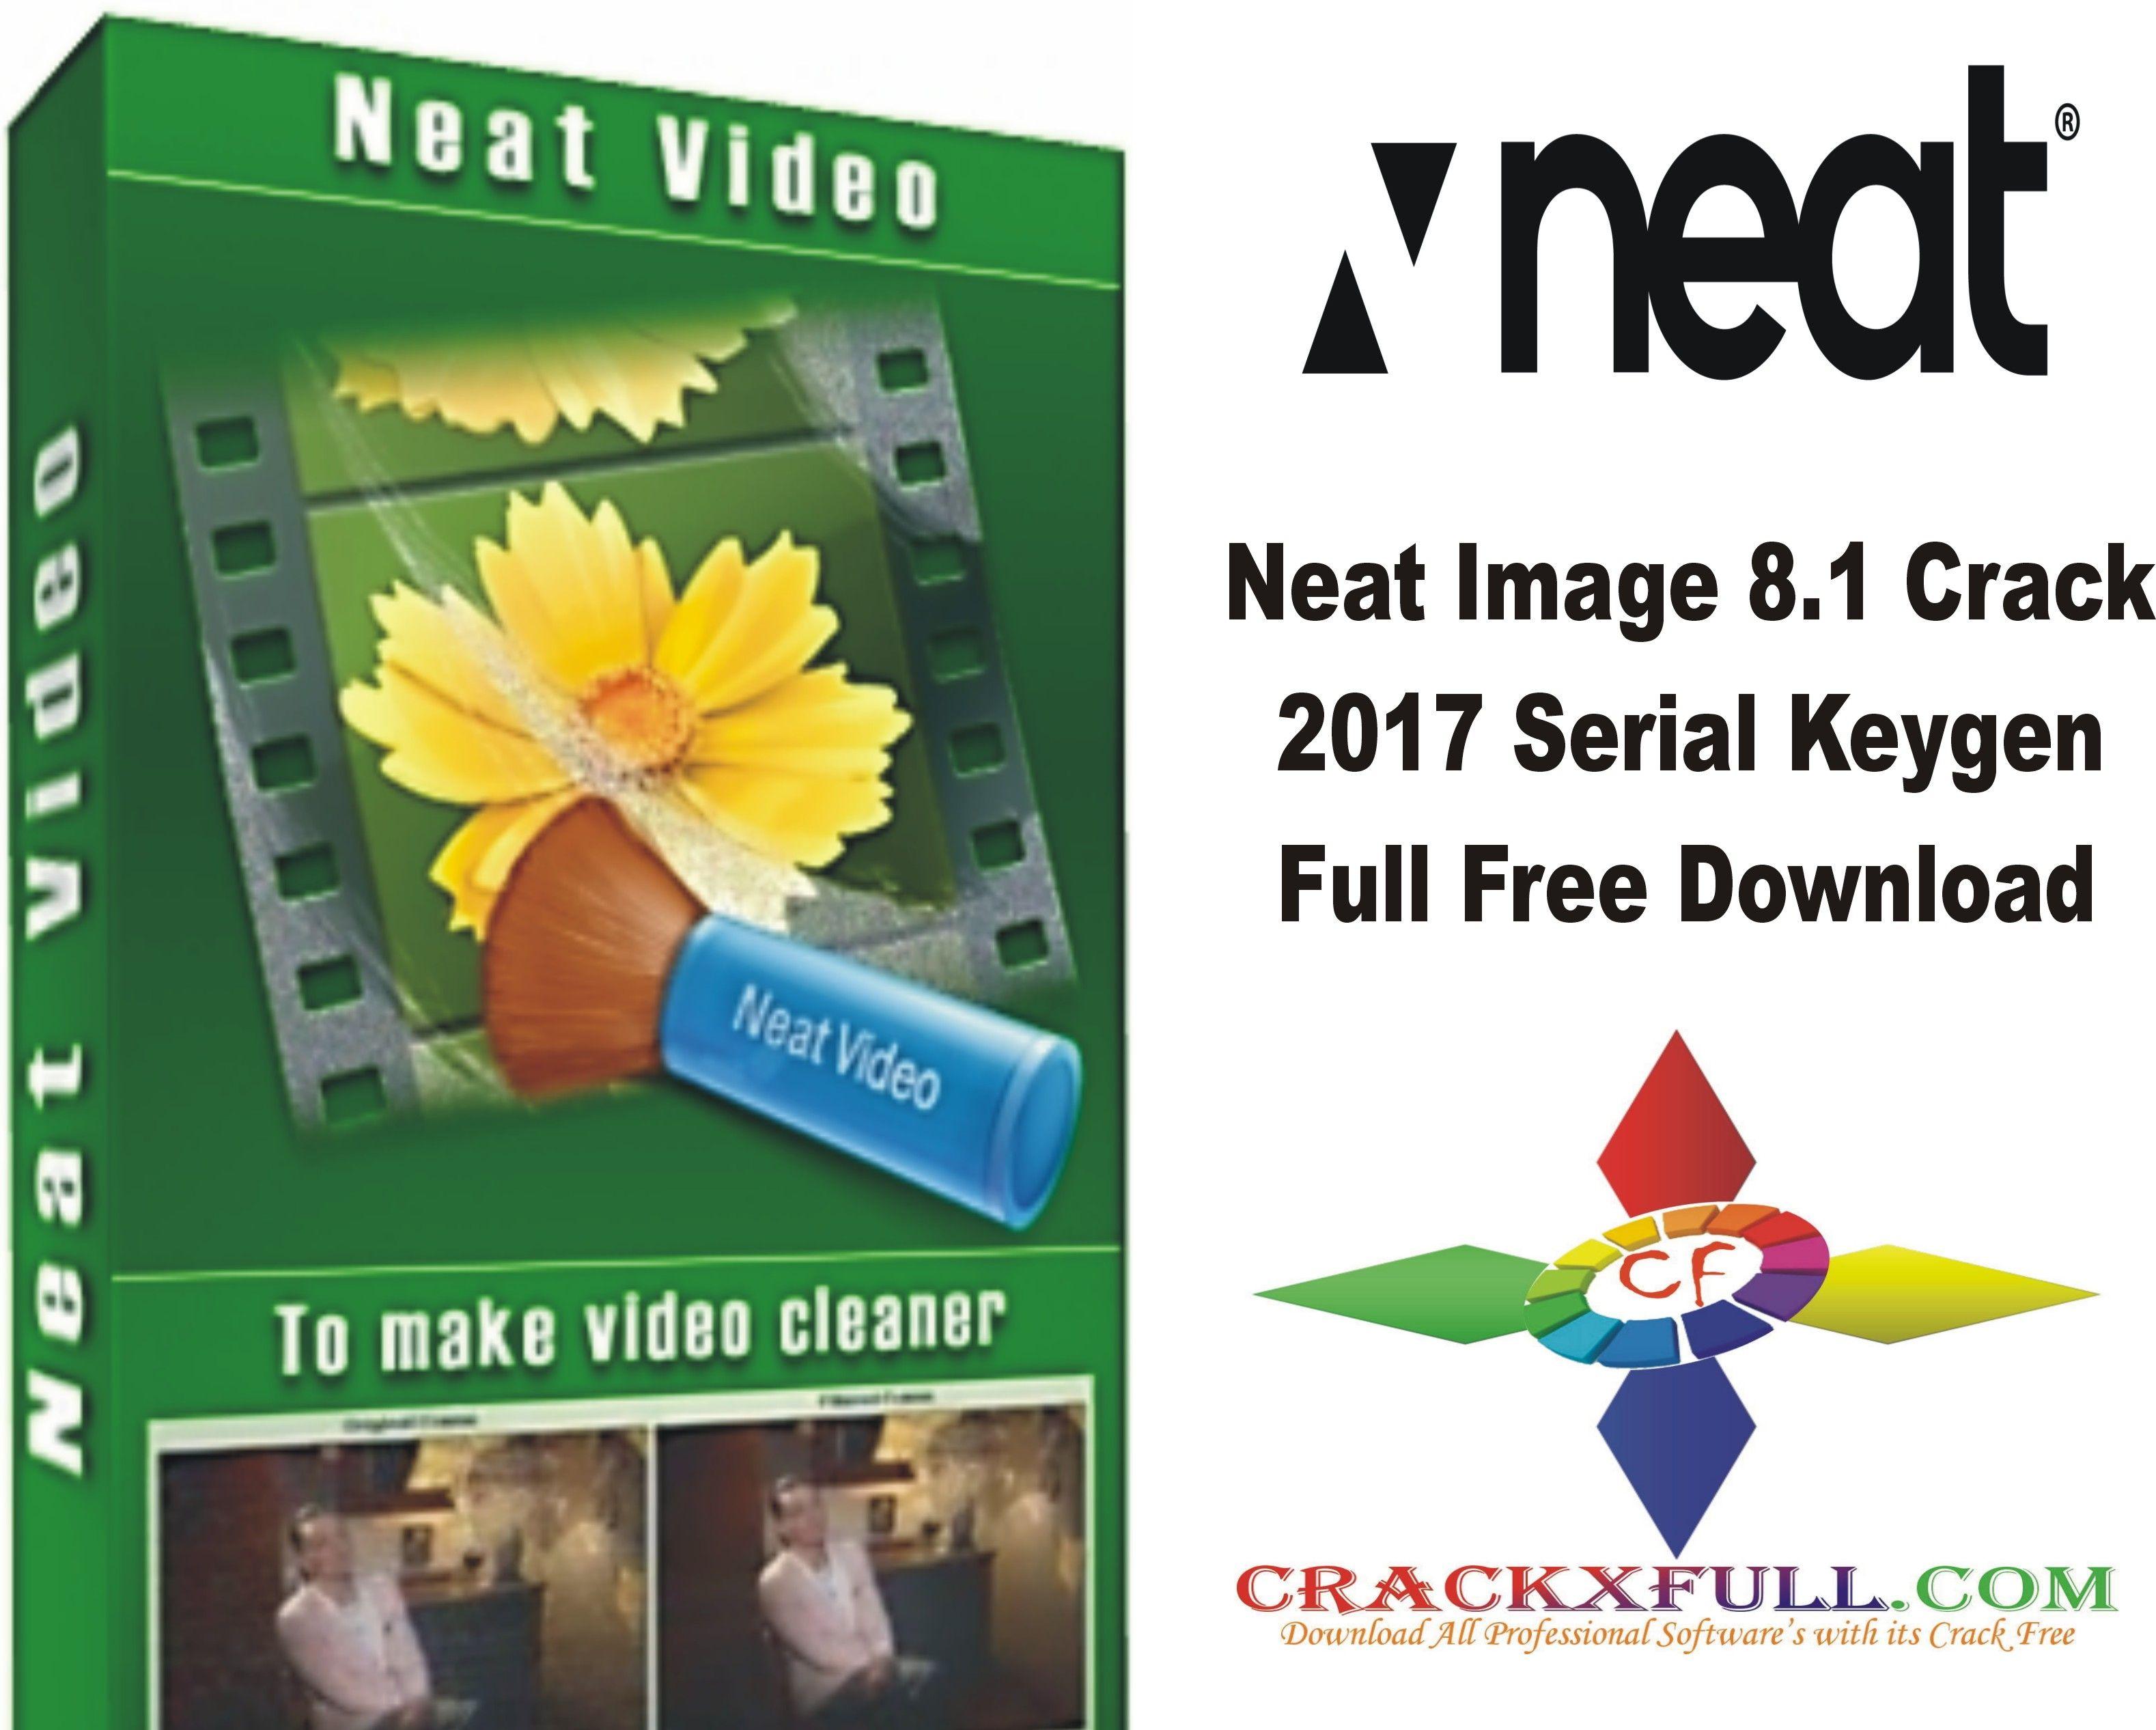 neat image free download